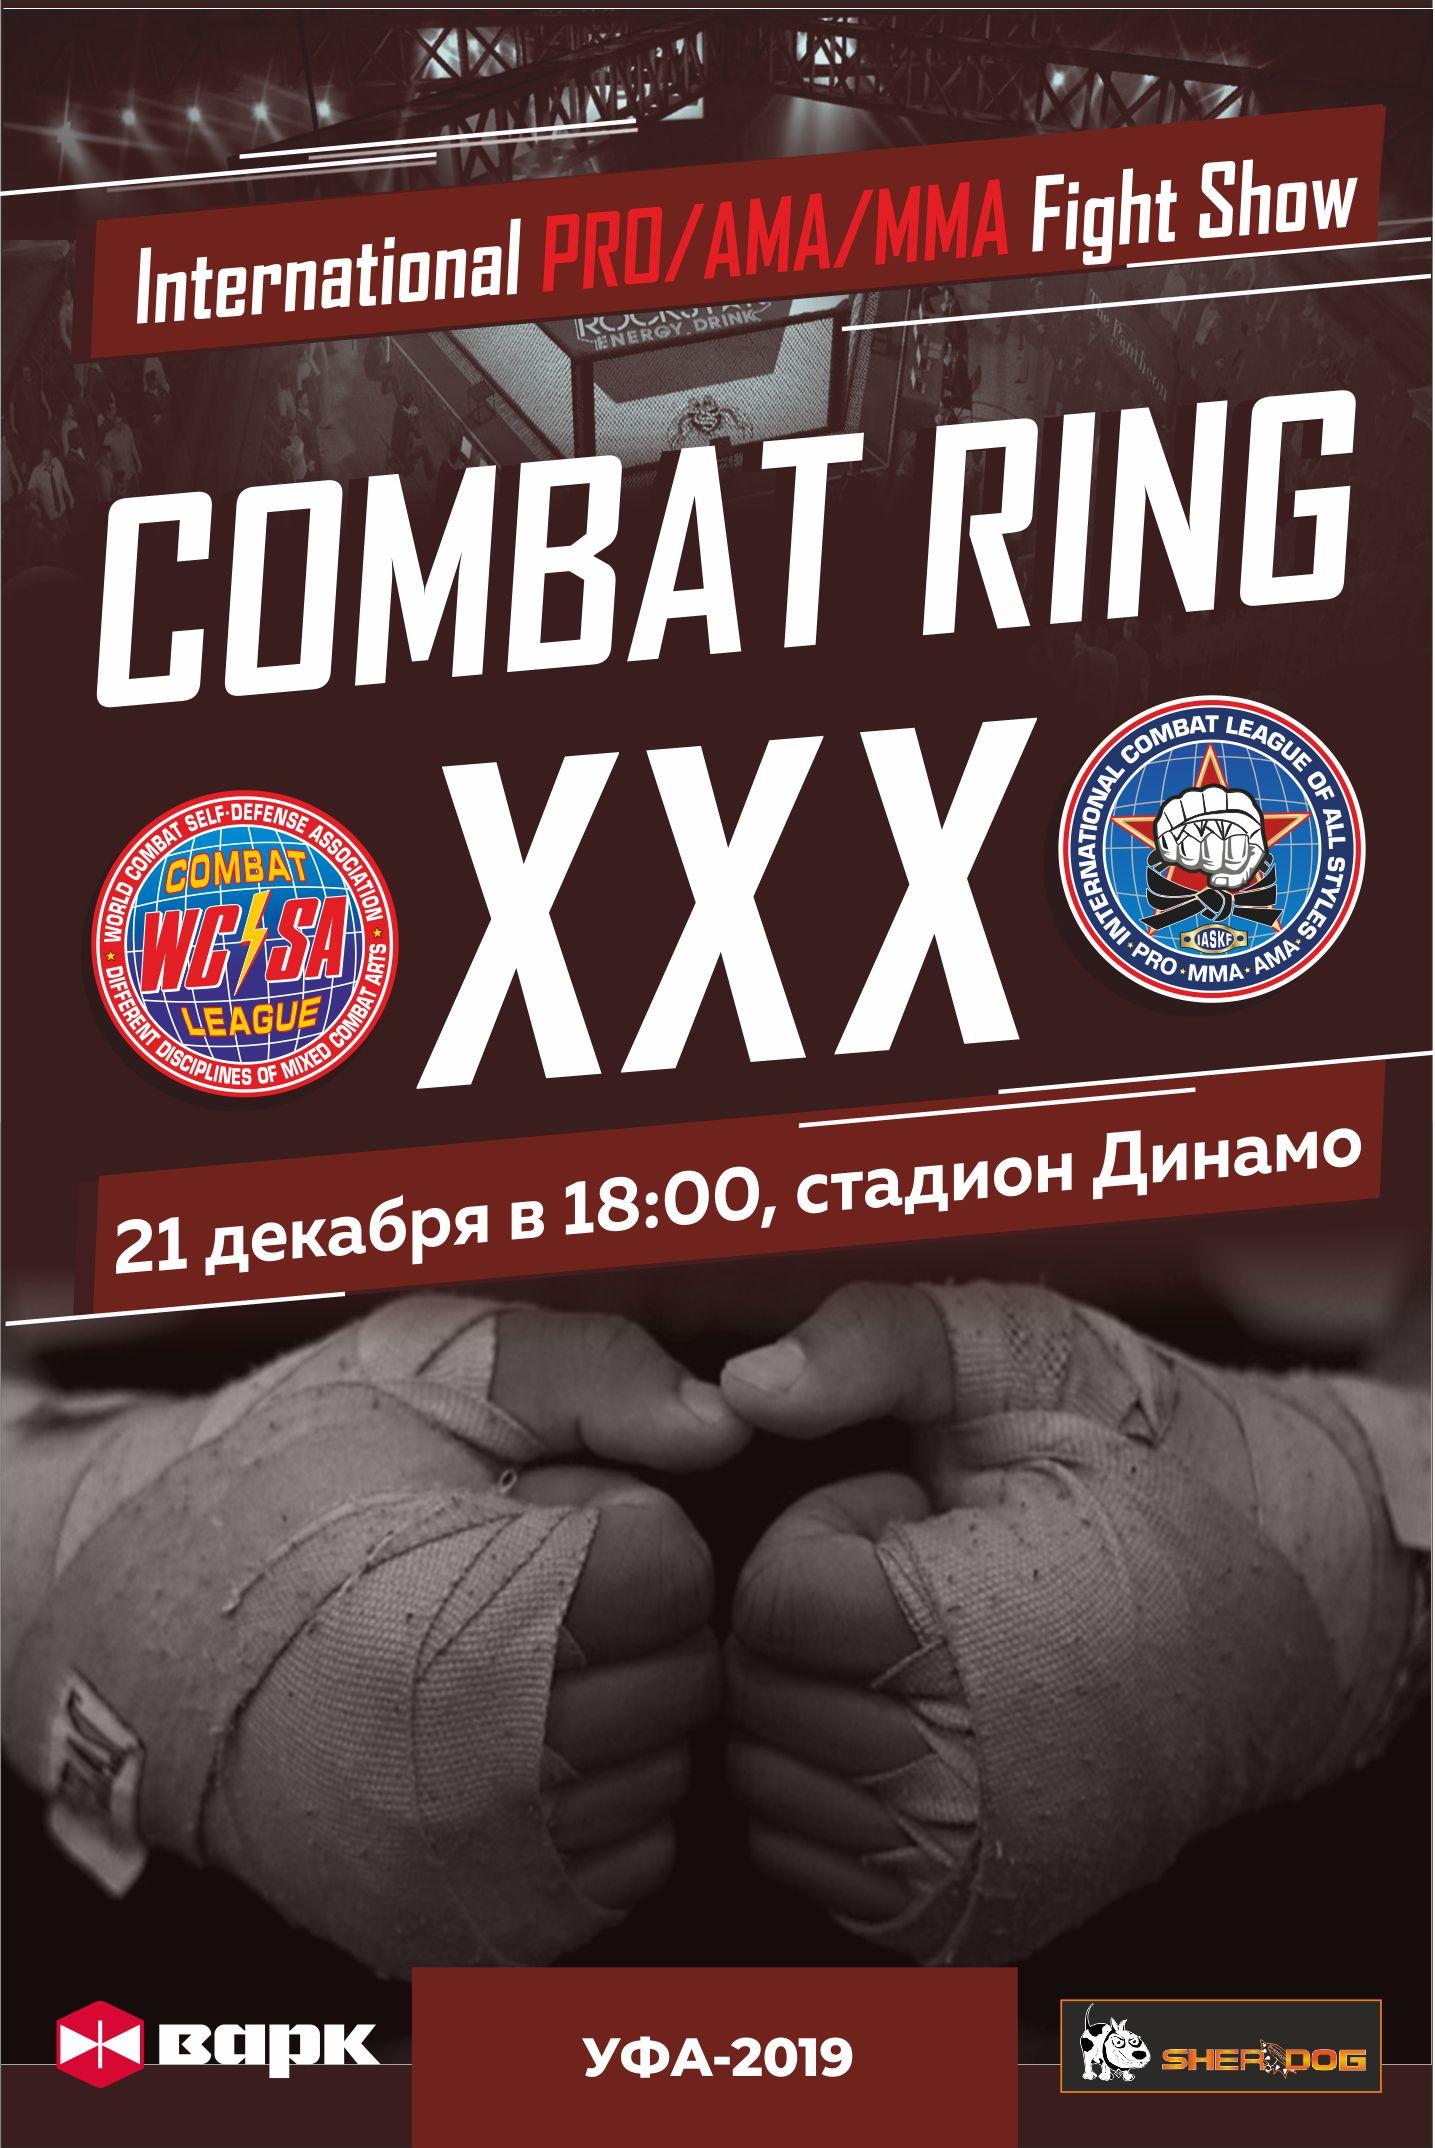 http://sbirb.combatsd.ru/images/upload/Комбат%20(2).jpg